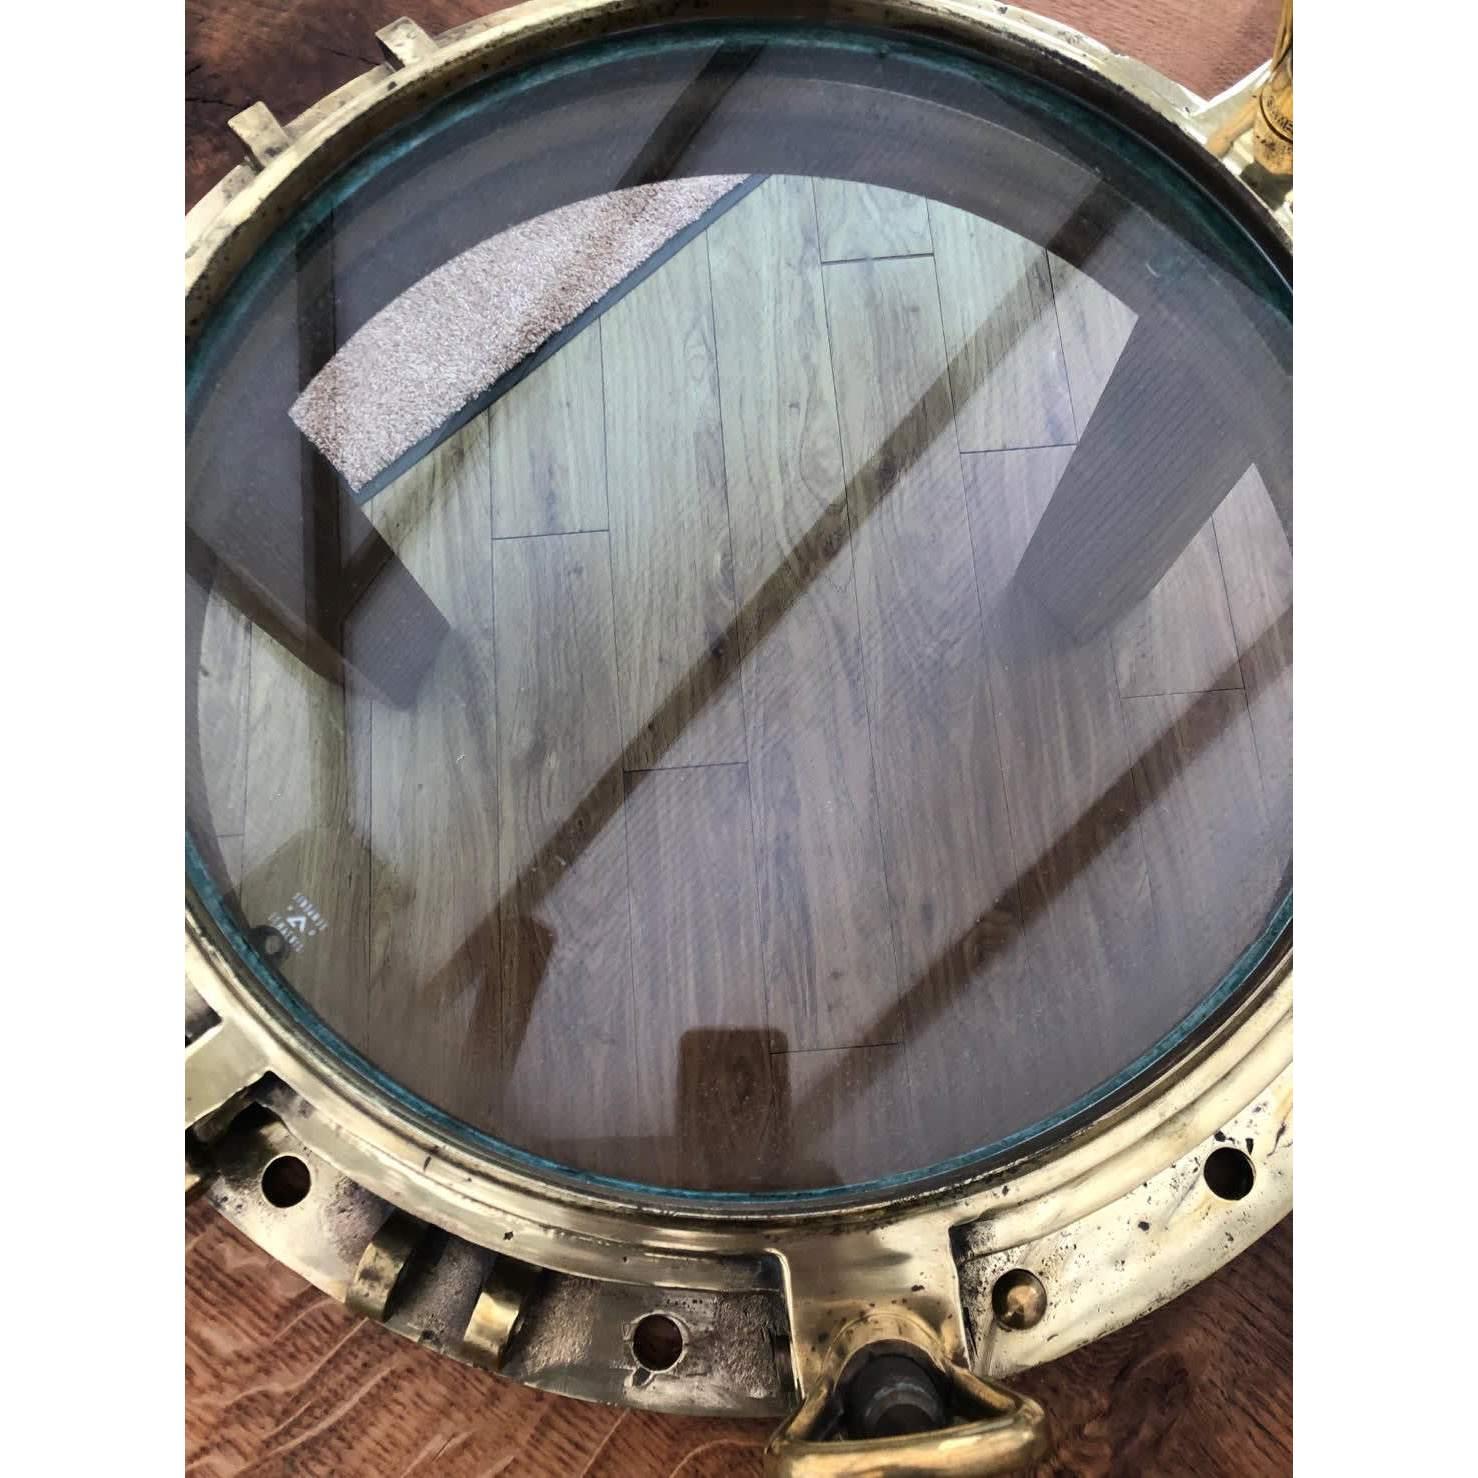 Infinite Surface Repairs Plymouth 07748 326882